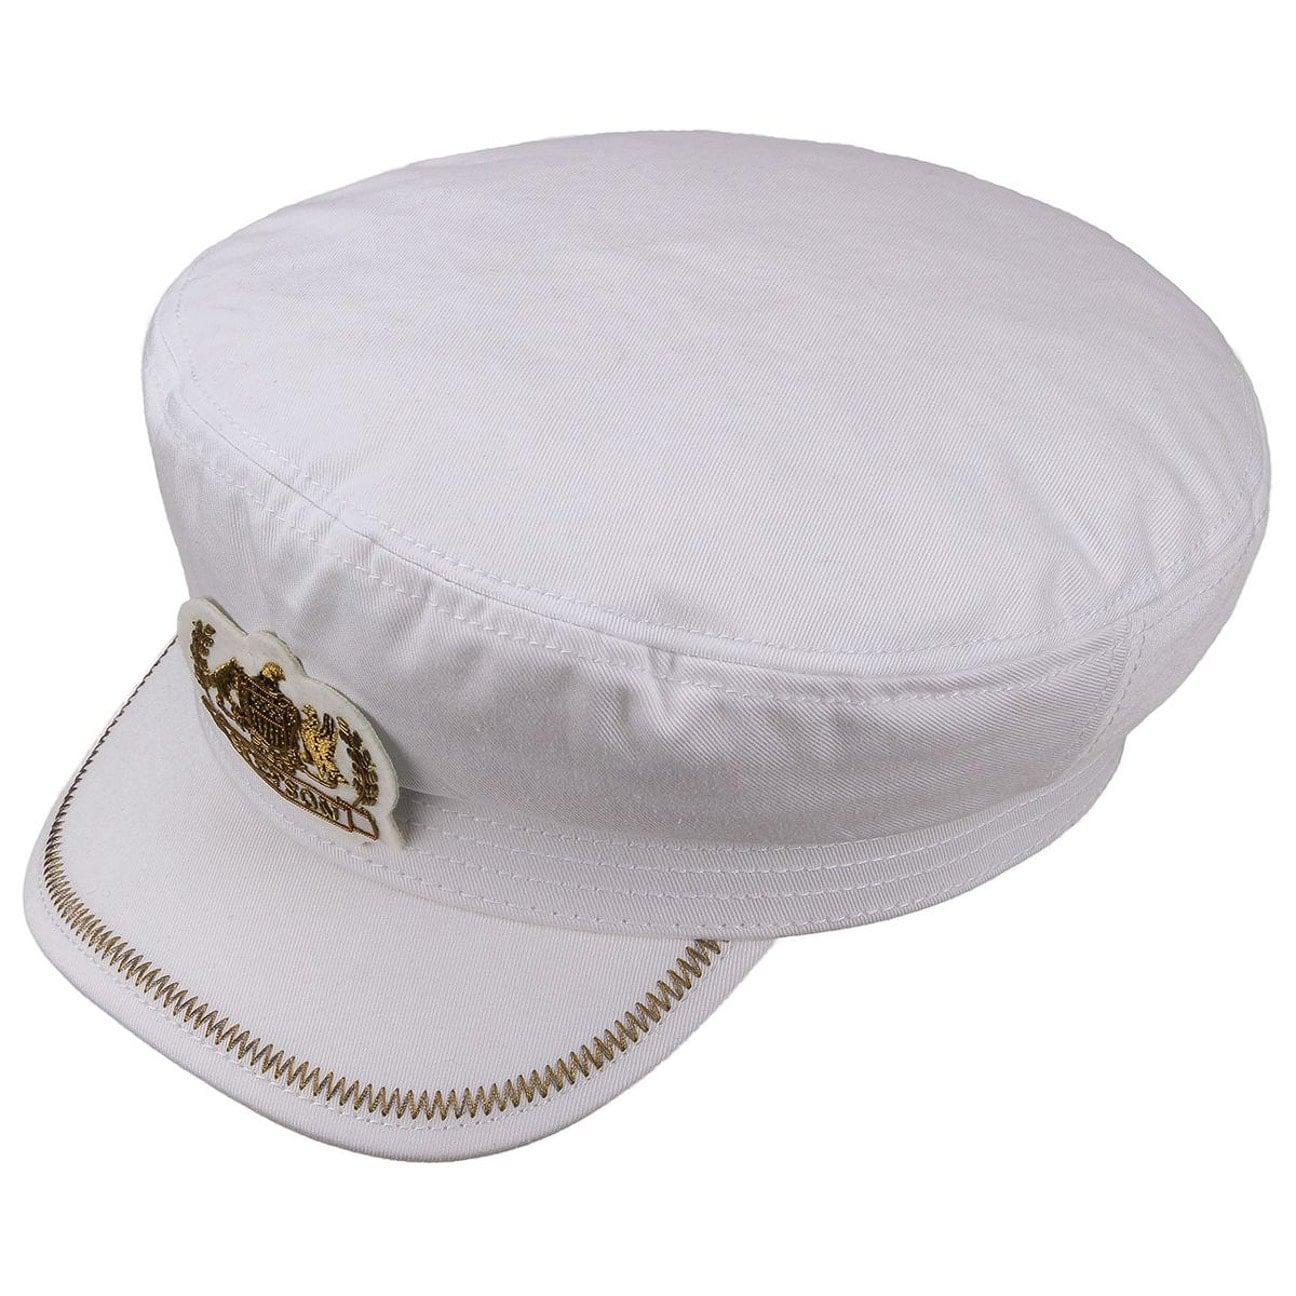 58bbac8e7 Allenport Fisherman's Hat by Stetson